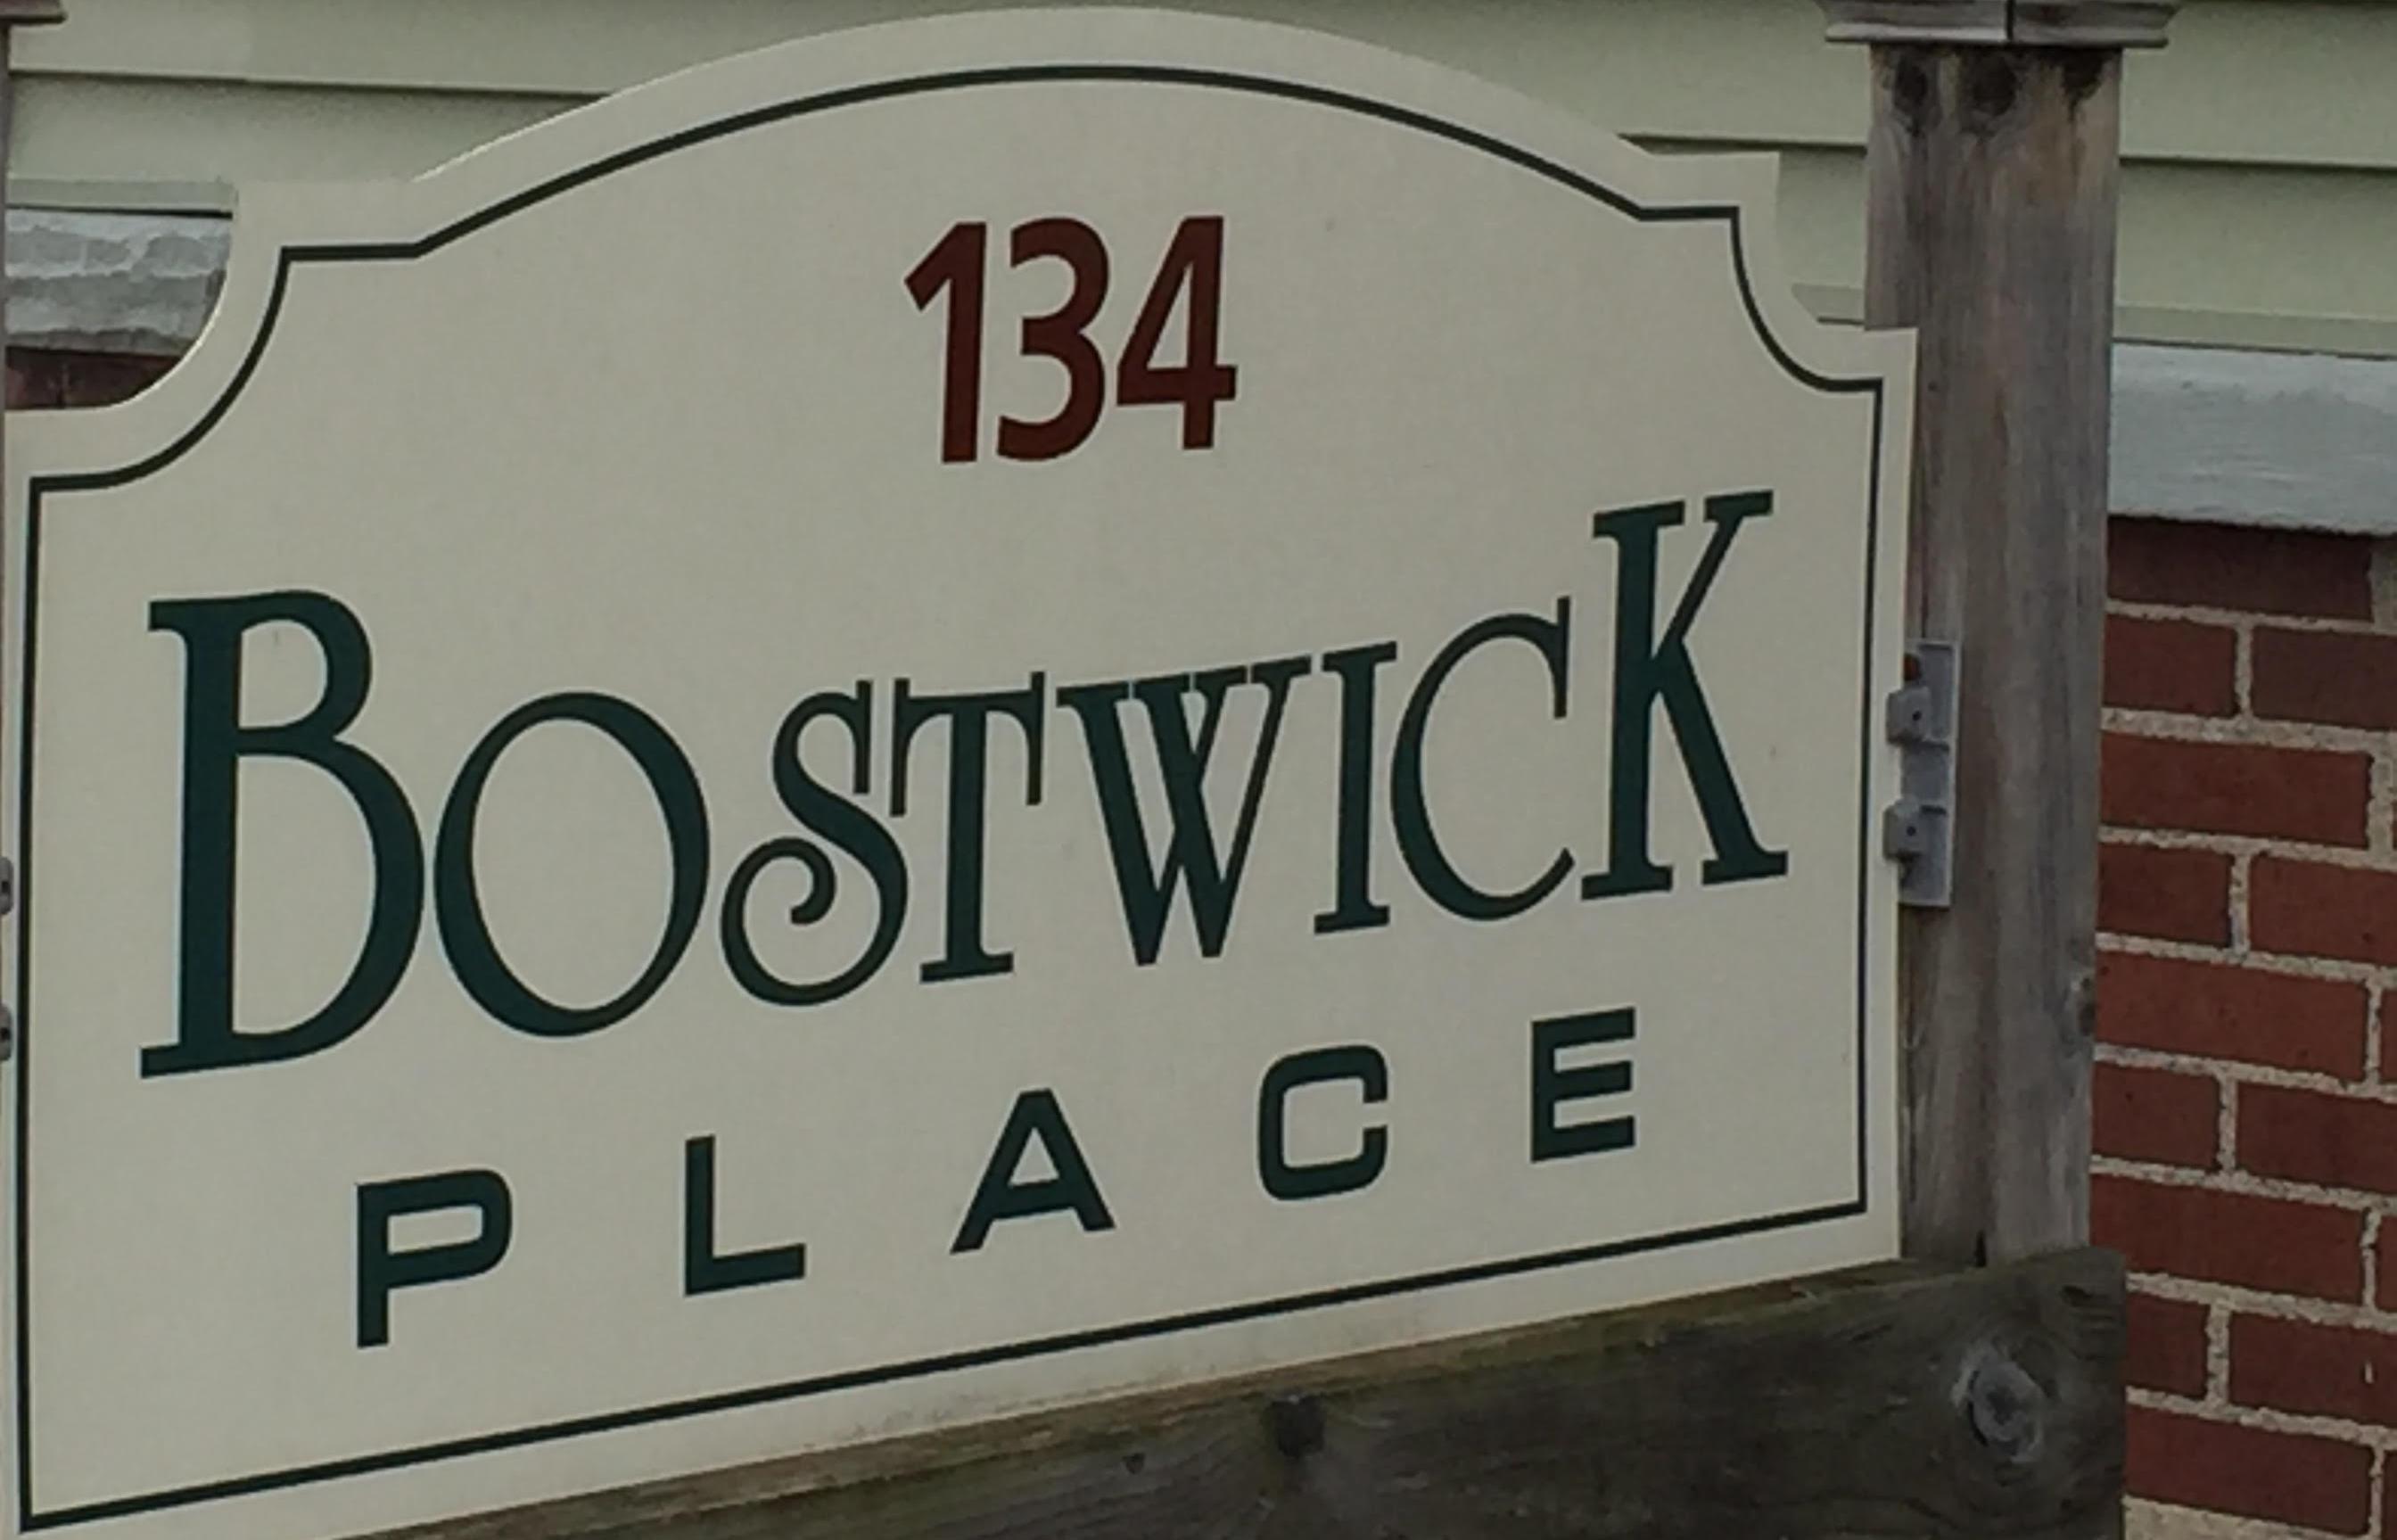 Bostwick Place 3 (2)